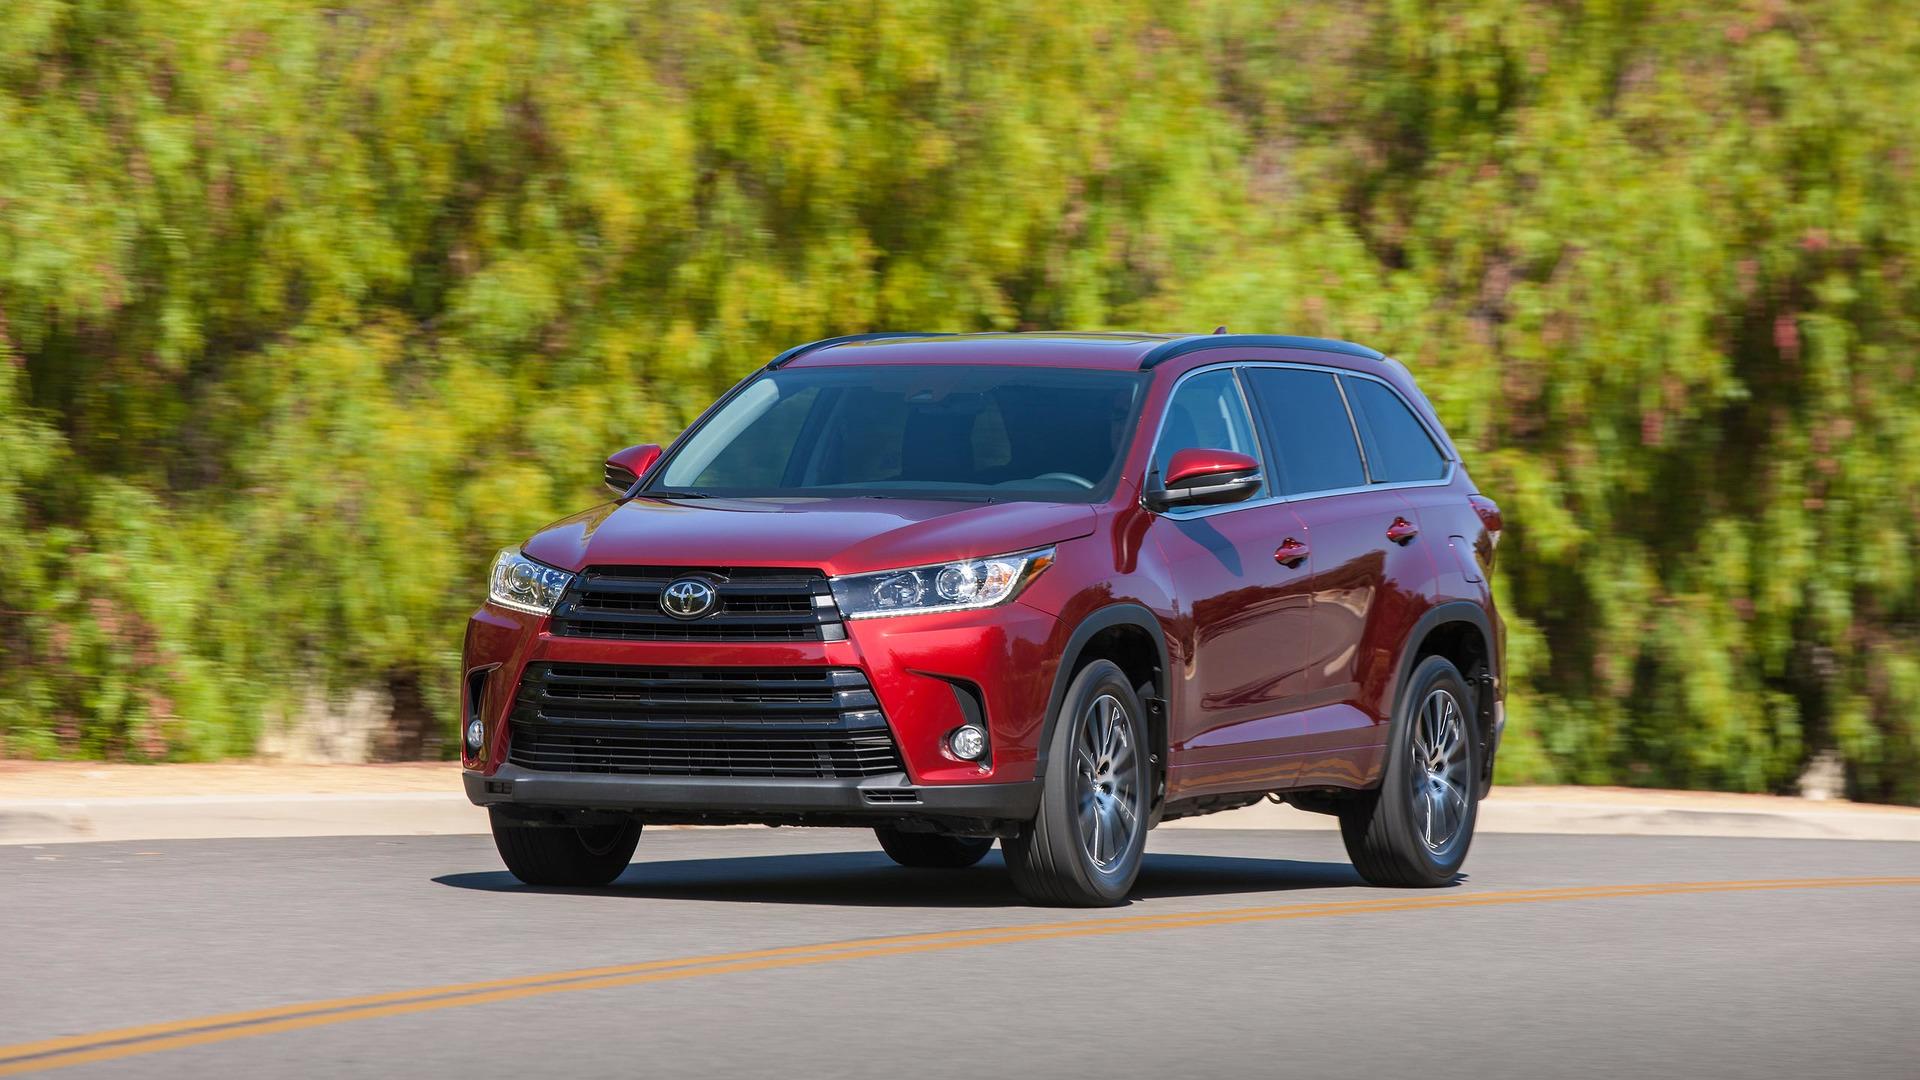 2017 Toyota Highlander Hybrid Gets Price Drop Updates Throughout Lineup